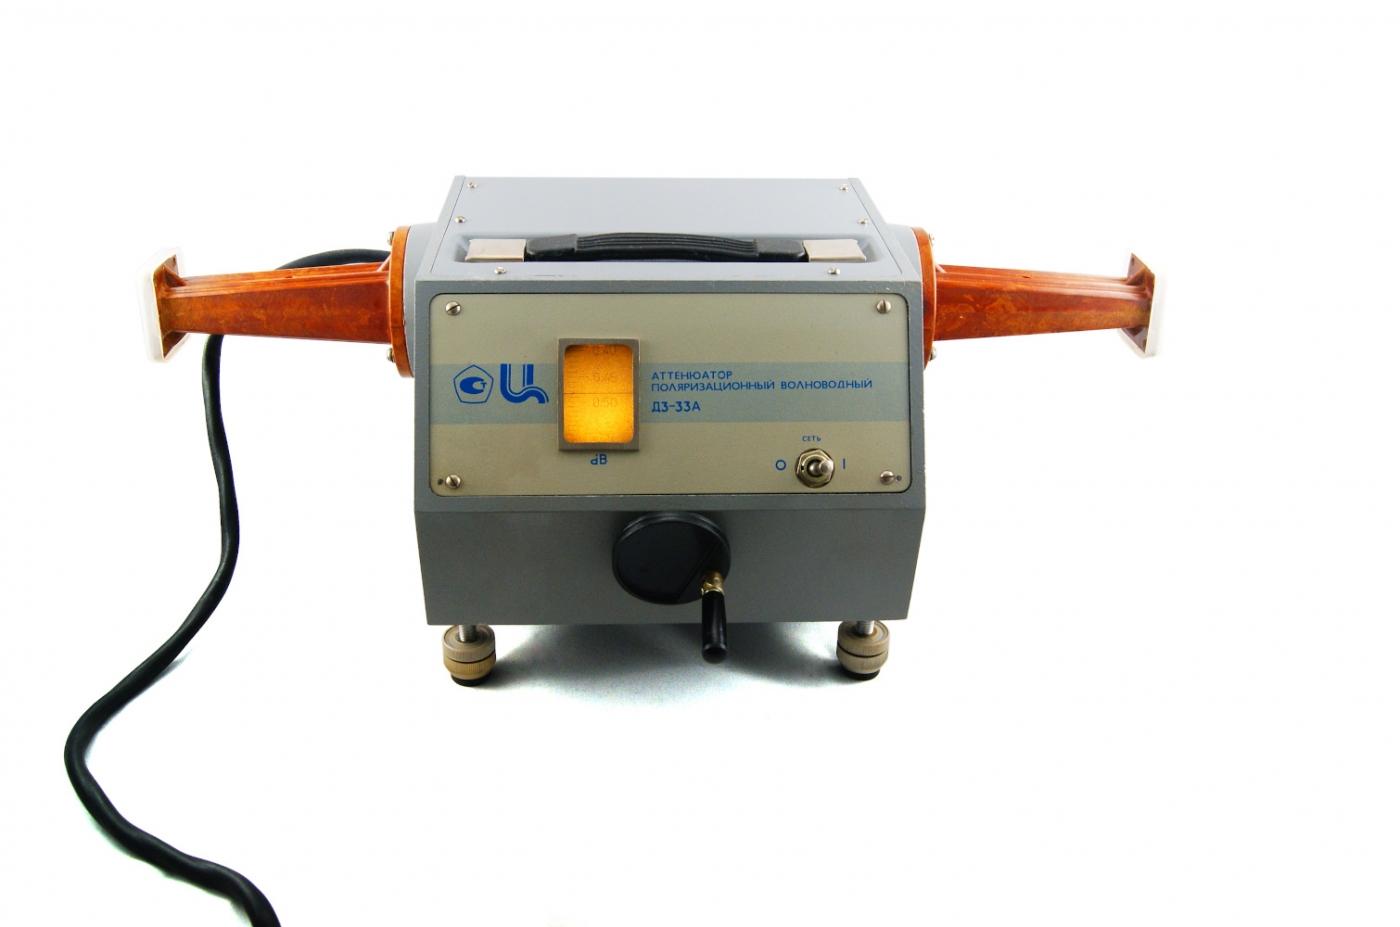 Аттенюатор поляризационный Д3-33А